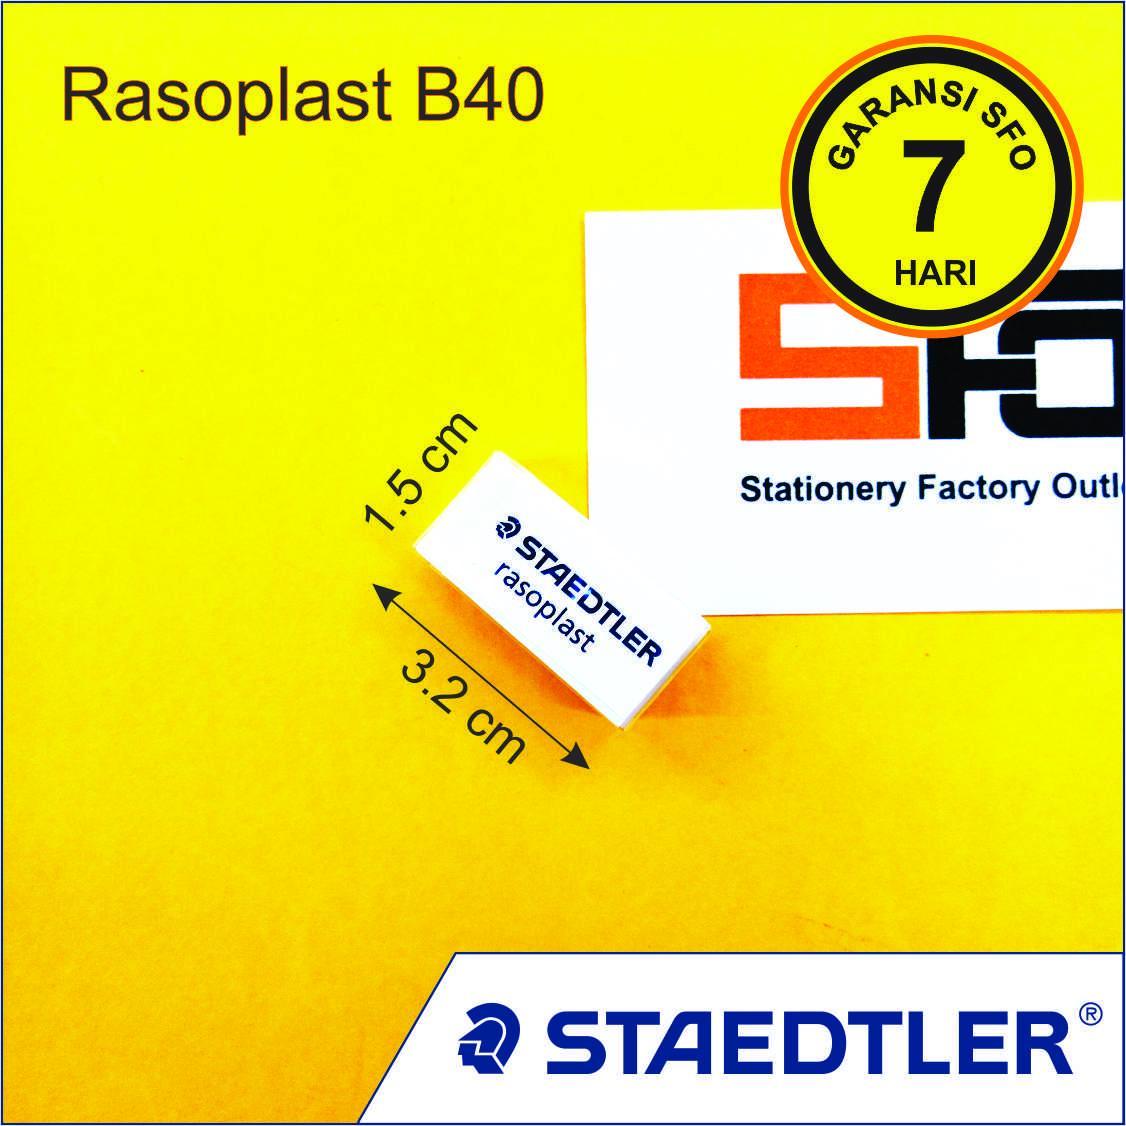 10 pcs Penghapus Staedtler Rasoplast